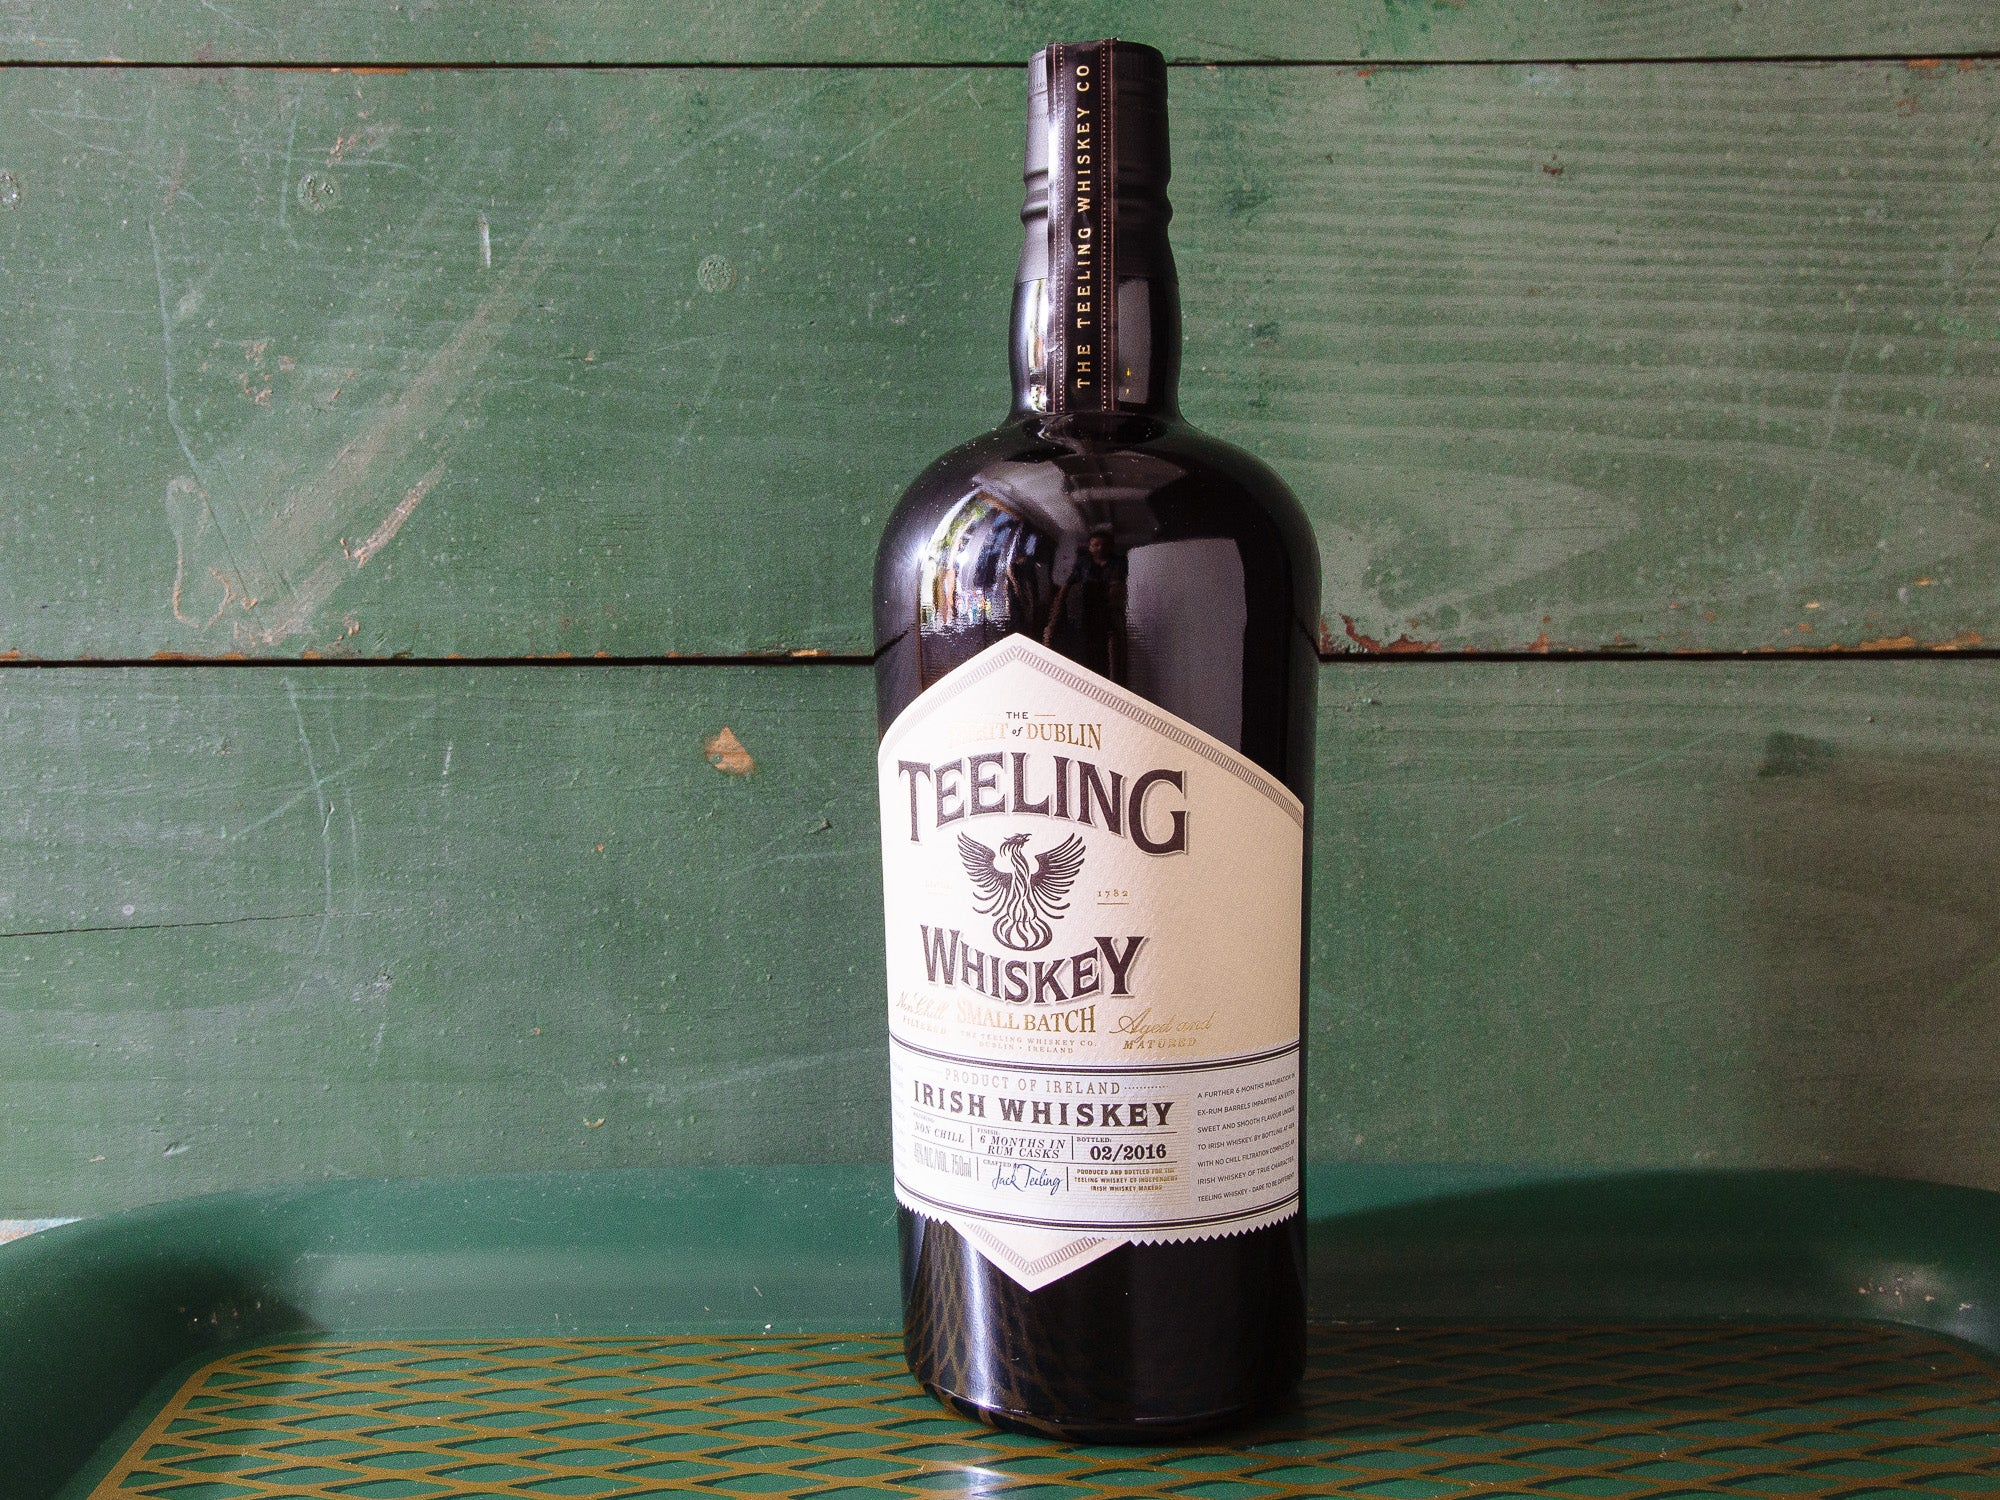 Teeling Whiskey Small Batch Irish Whiskey